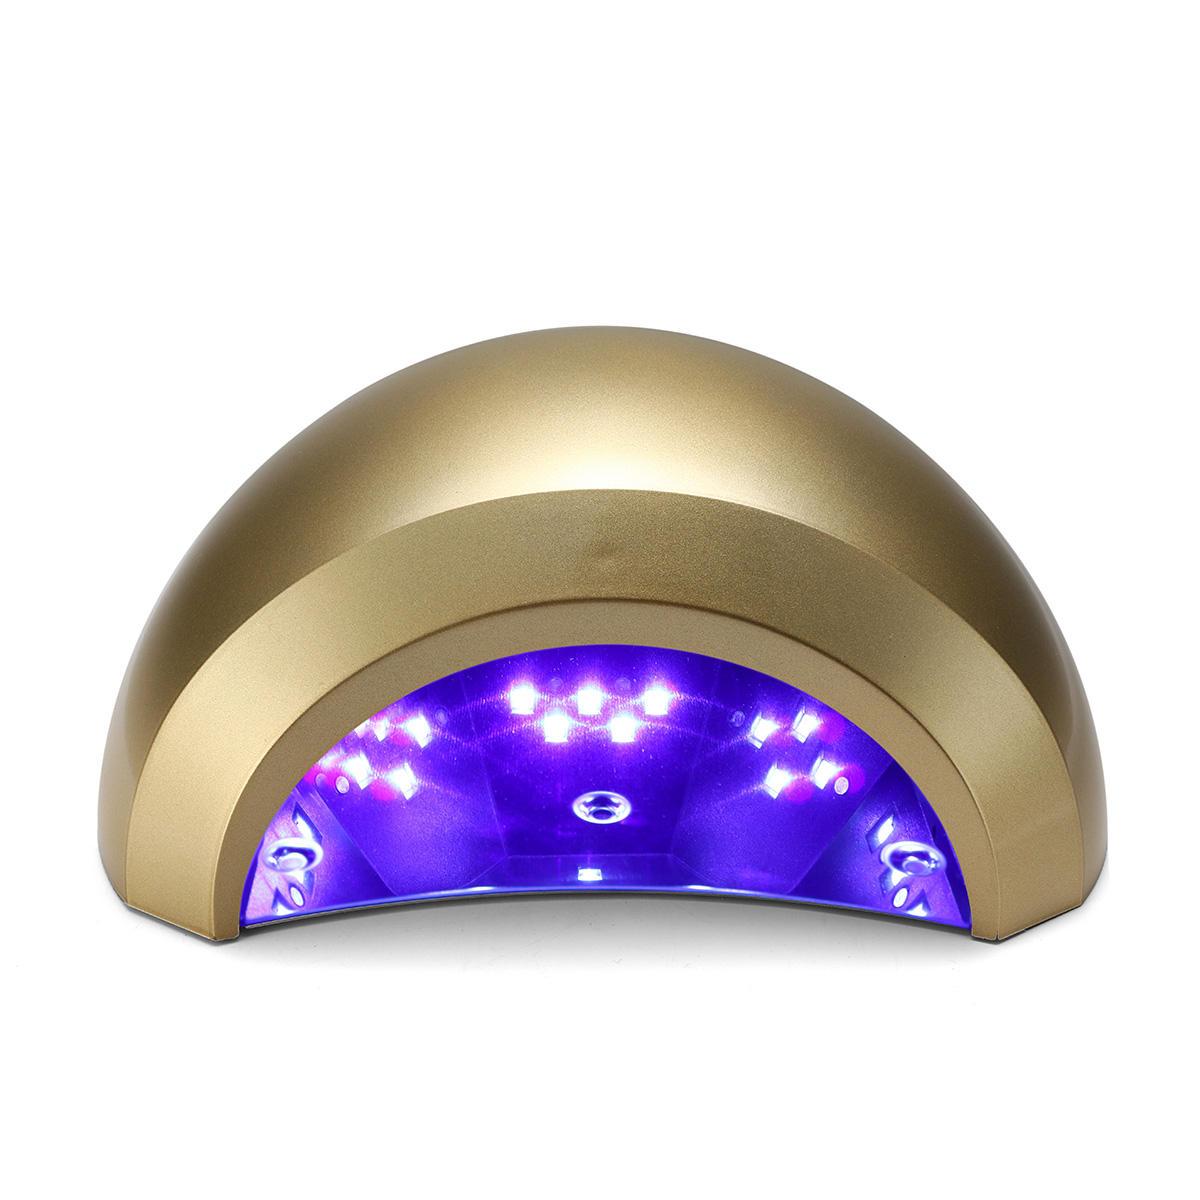 48W LED UV Lamp Time Setting Gel Polish Curling Nail Dryer Salon Tool Infrared Sensing 110-240V